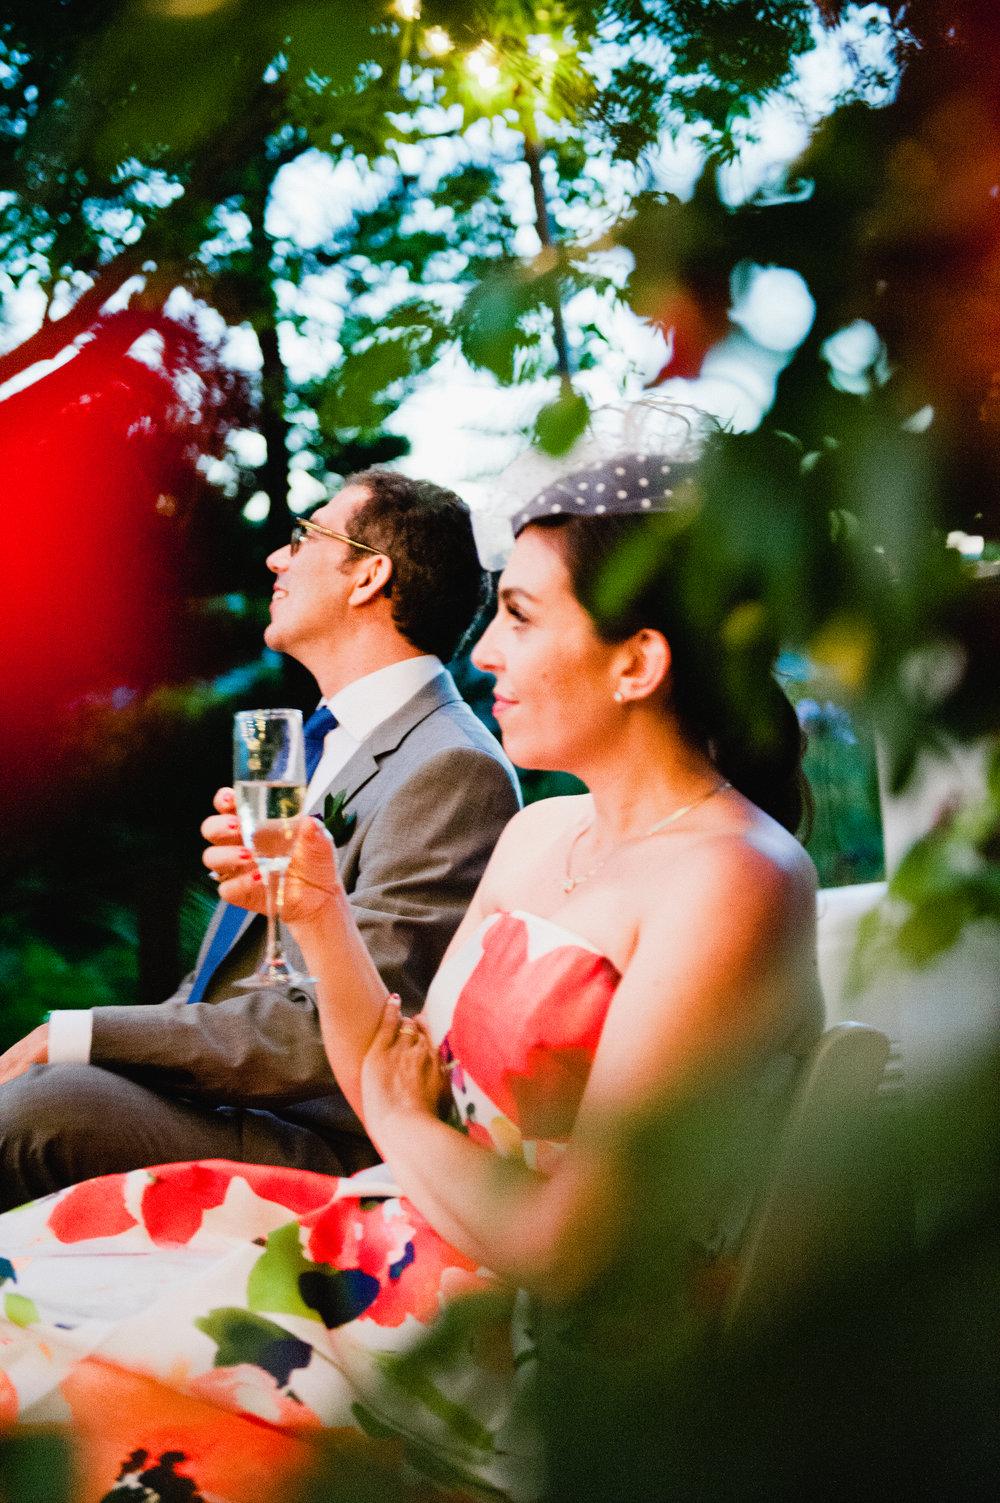 Los Angeles Wedding, Red Anchor Photo, Sarina Cass,California Wedding Photographer, Ojai California, Big Sur California Wedding Photographer, Los Angeles Wedding Photographer, Red Anchor Photo wedding Sarina Cass wedding